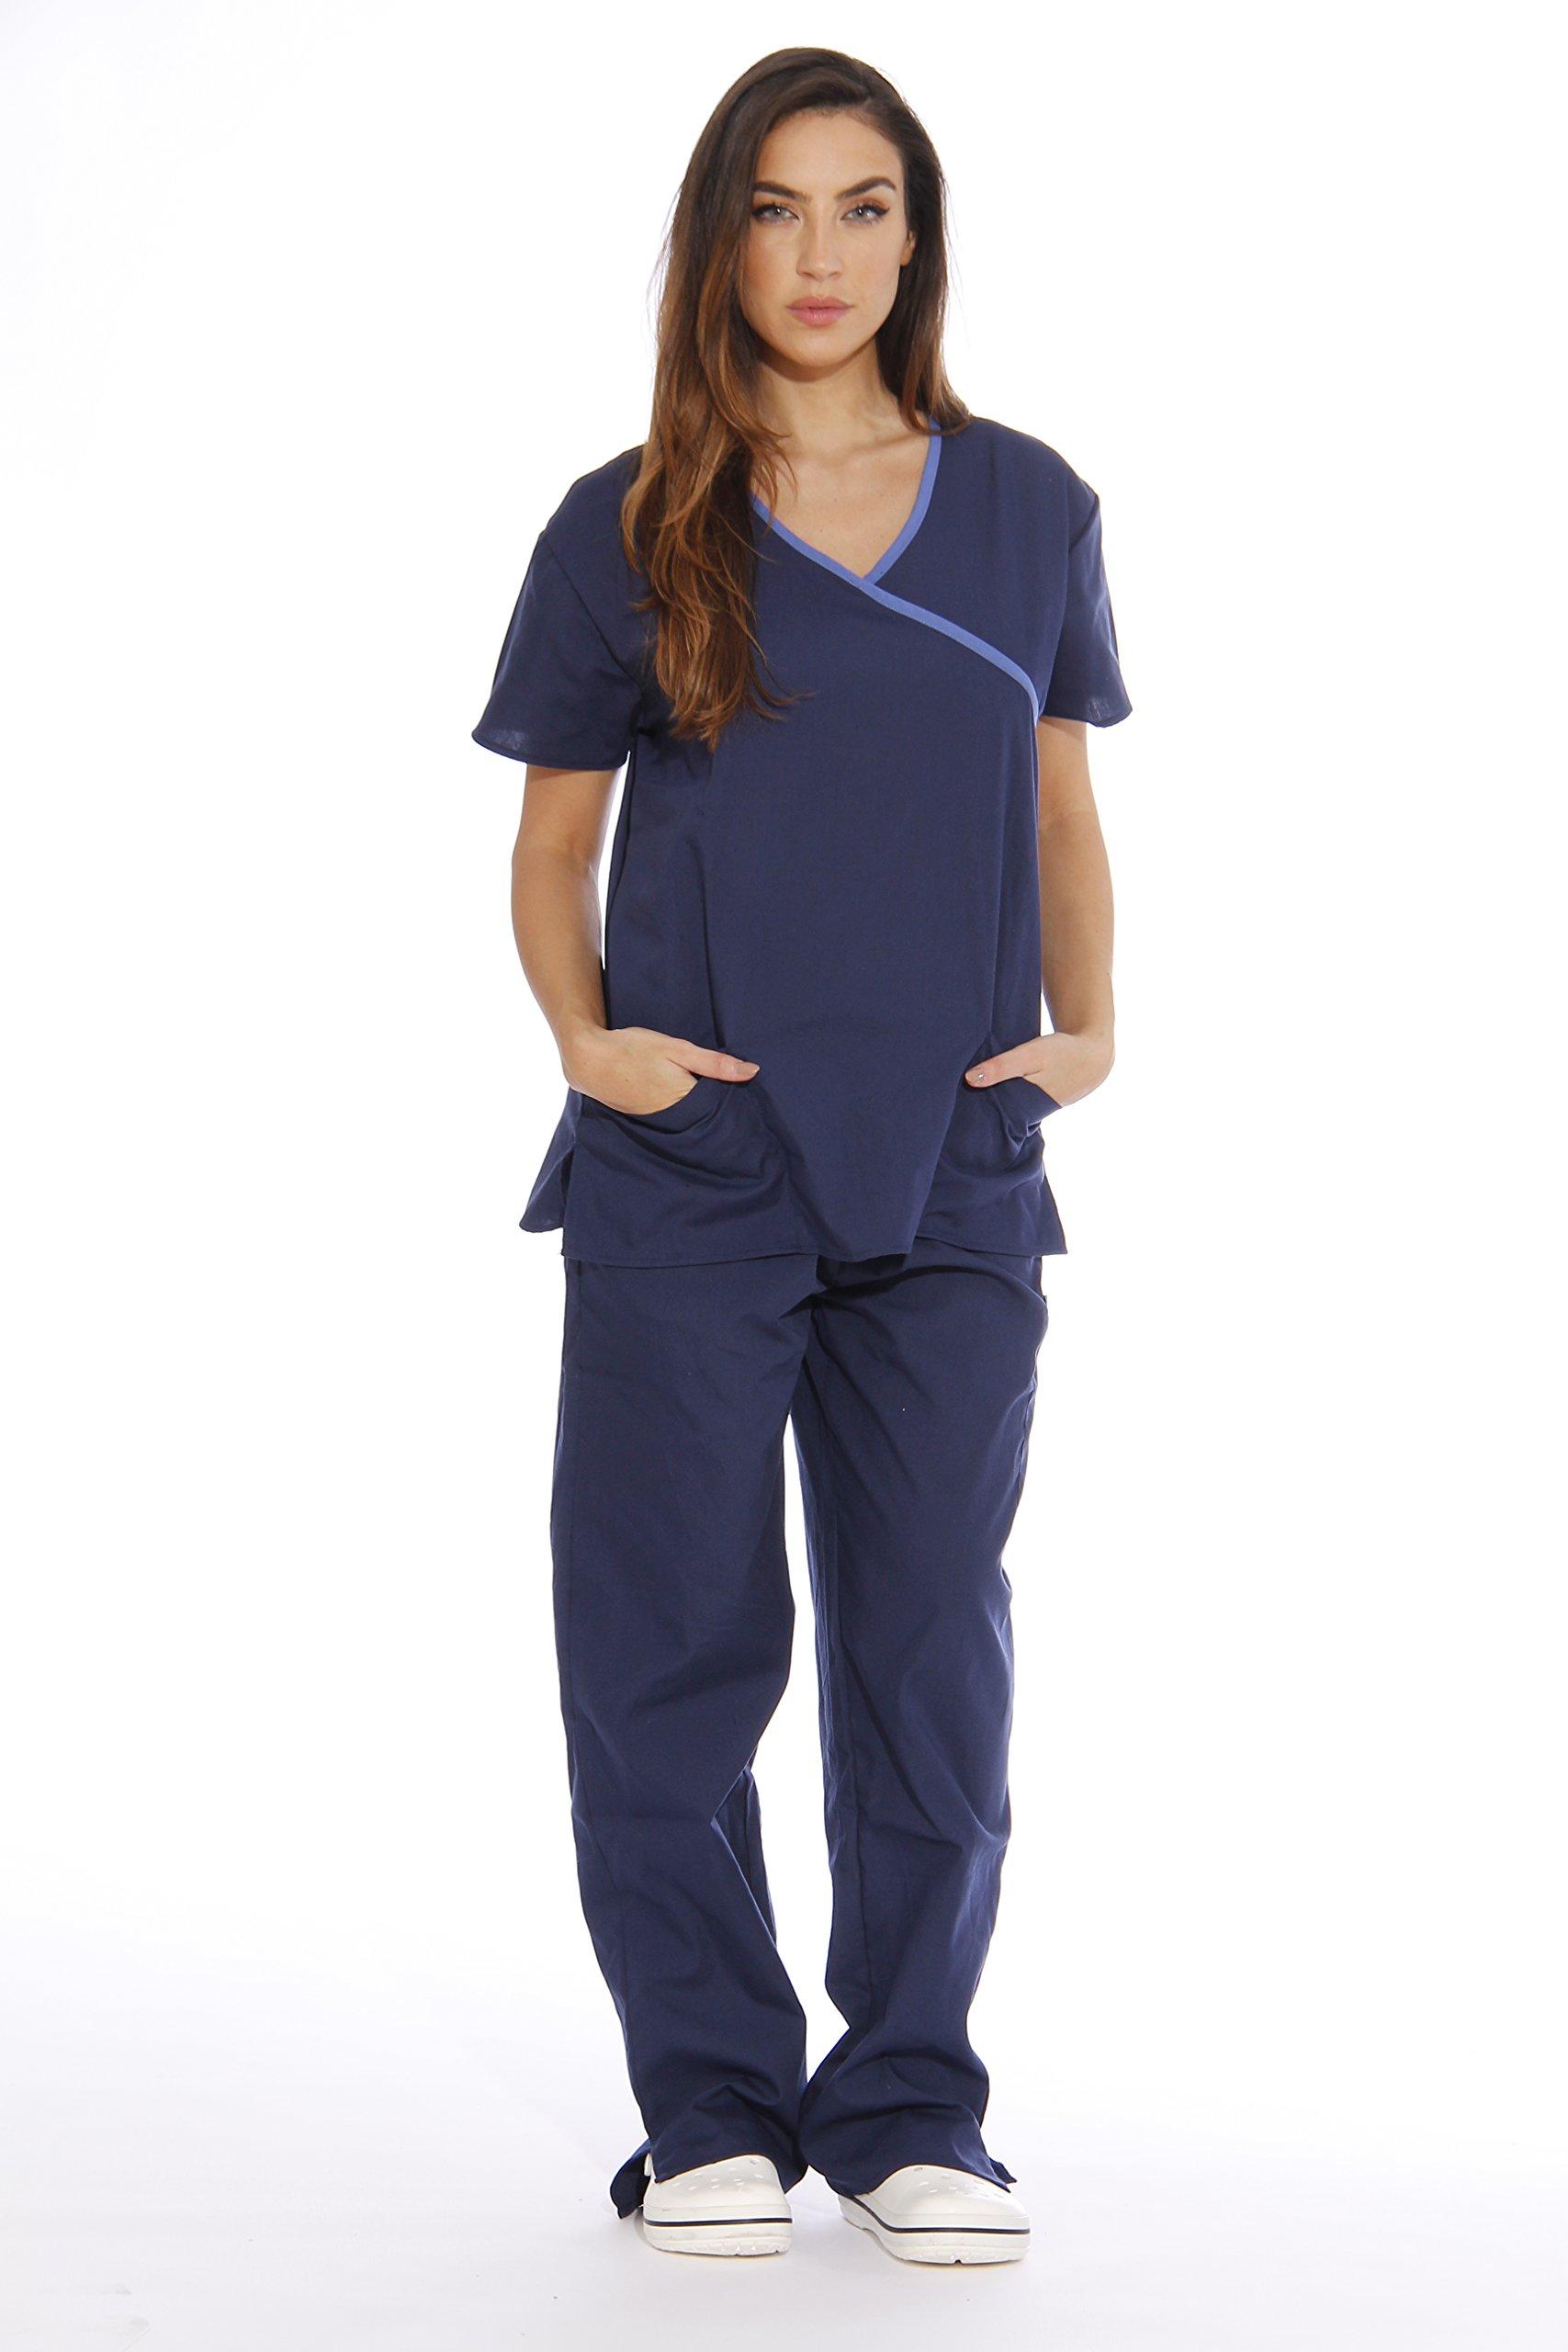 Just Love Women's Scrub Sets Medical Scrubs (Mock Wrap) 11143W-3X